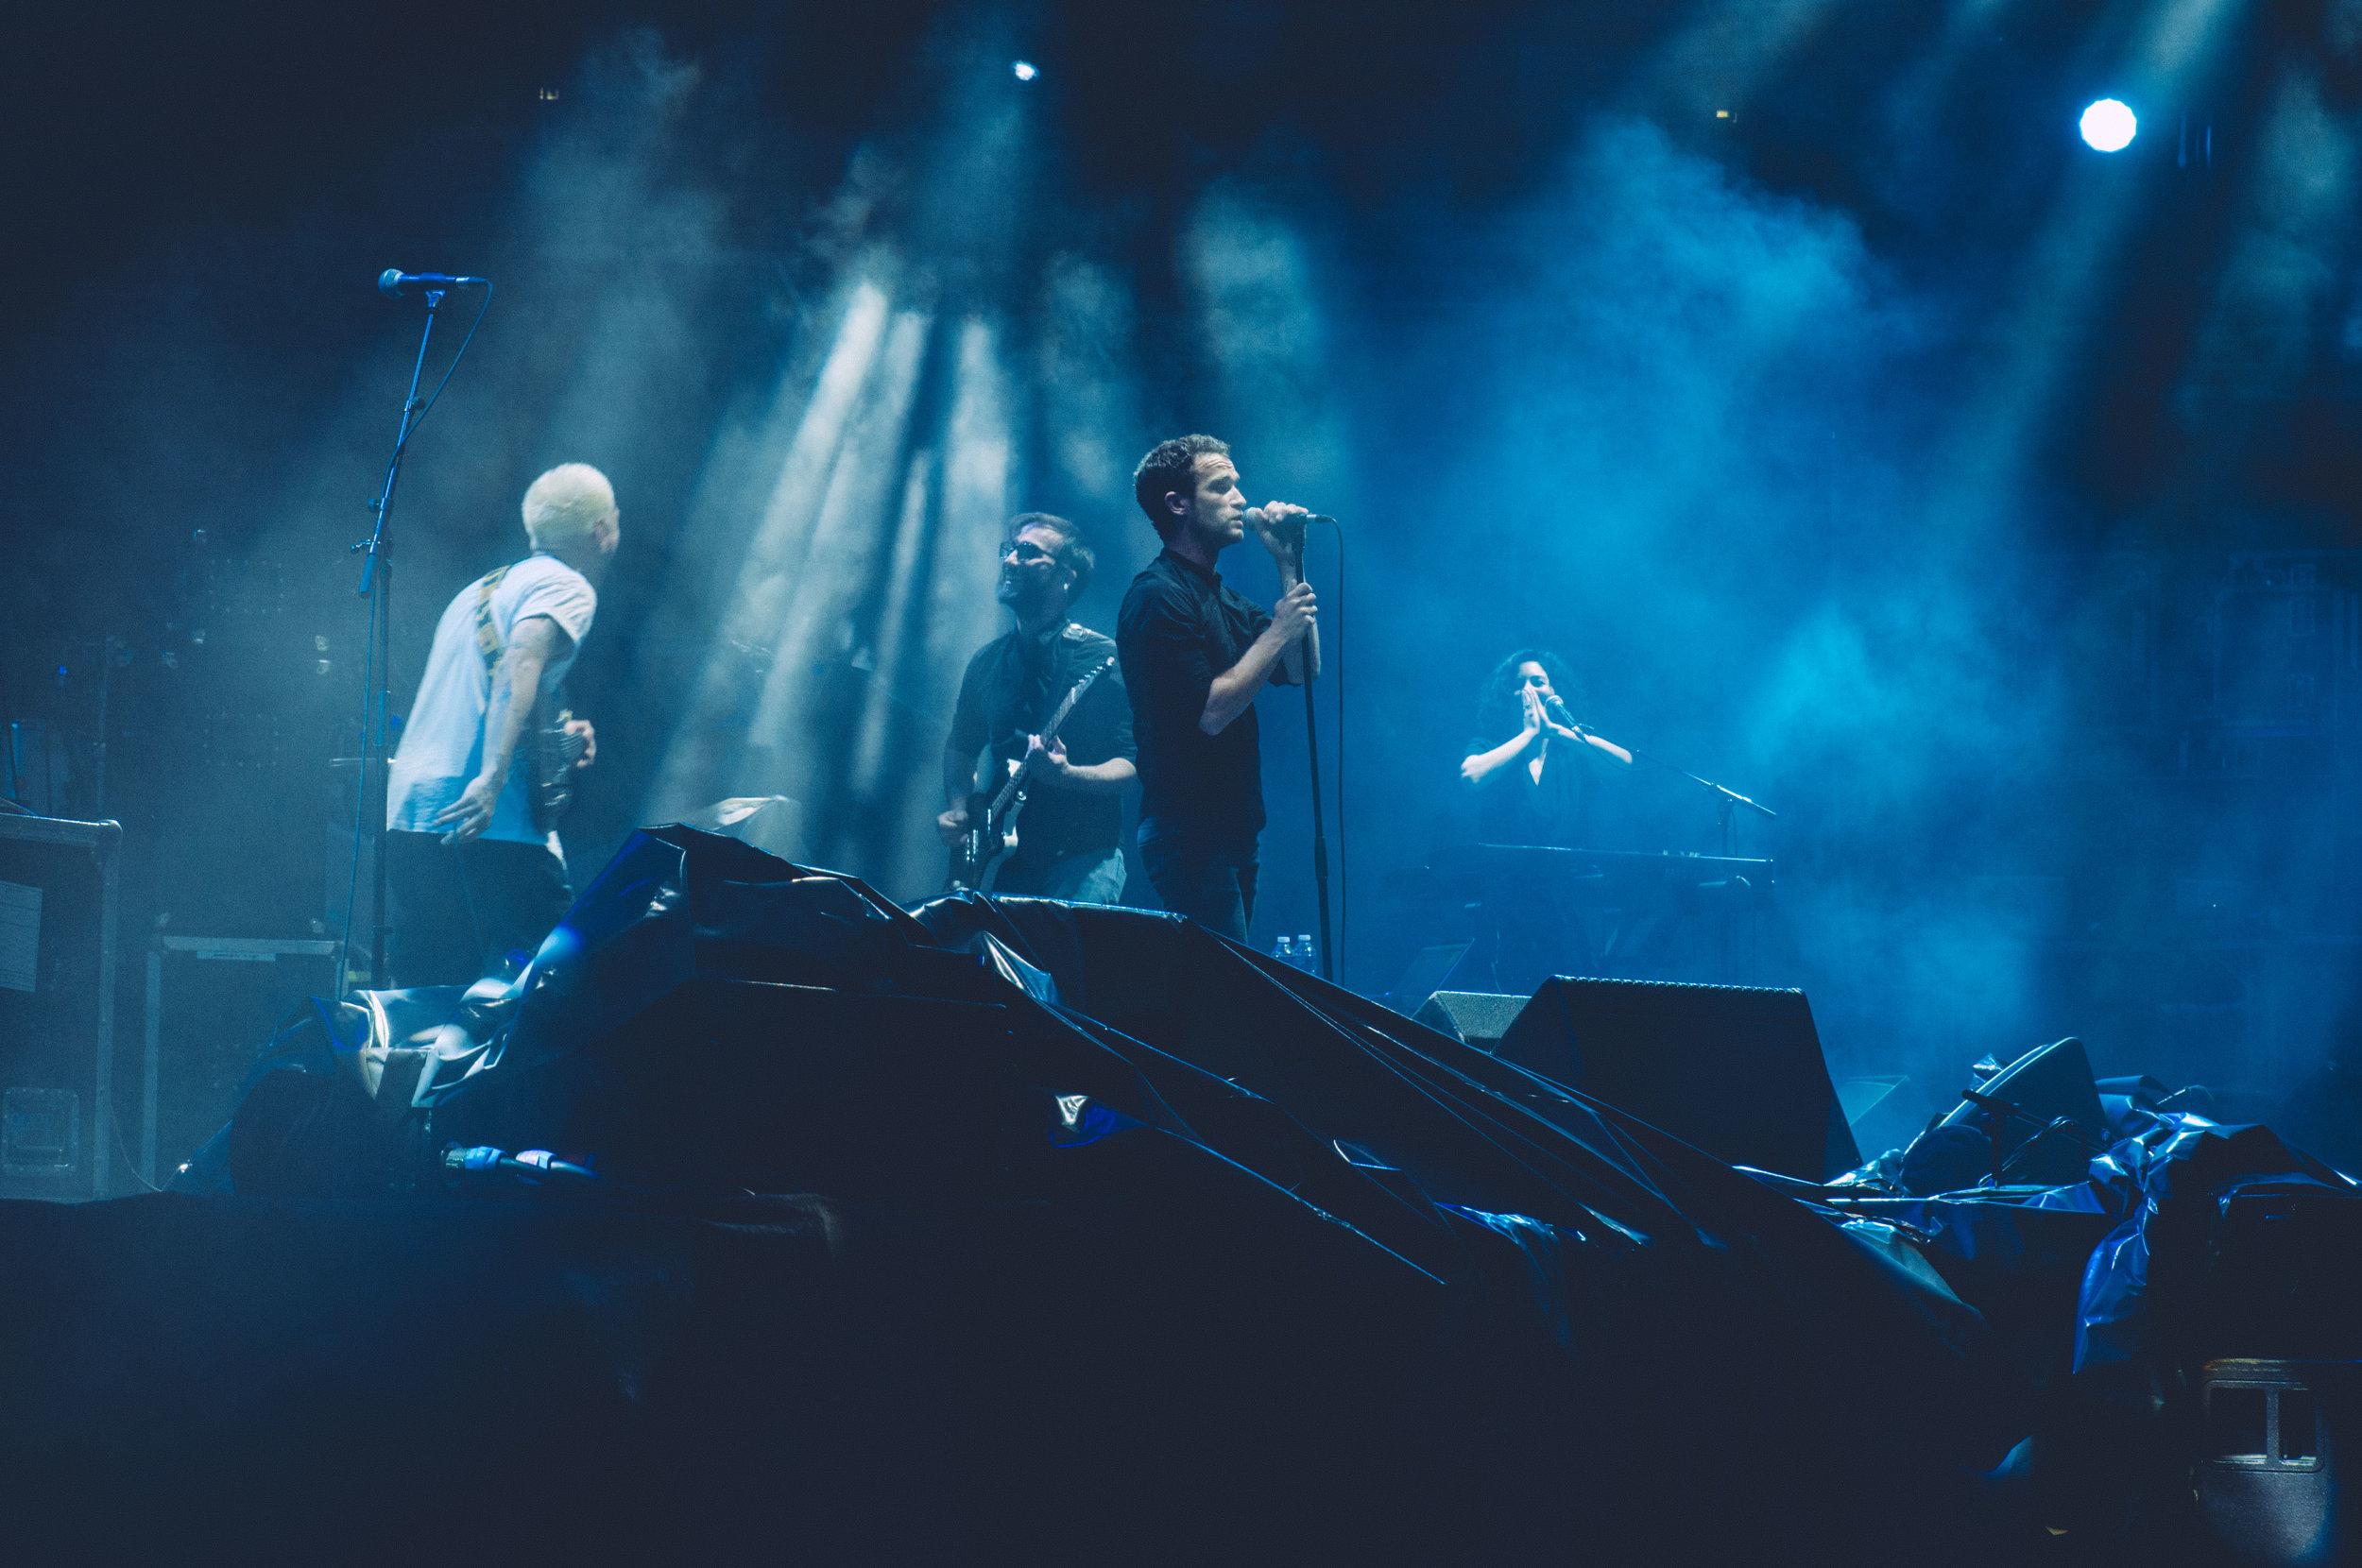 20160723-MarvinJouno-Live-Nimes-PremierJet-93.jpg